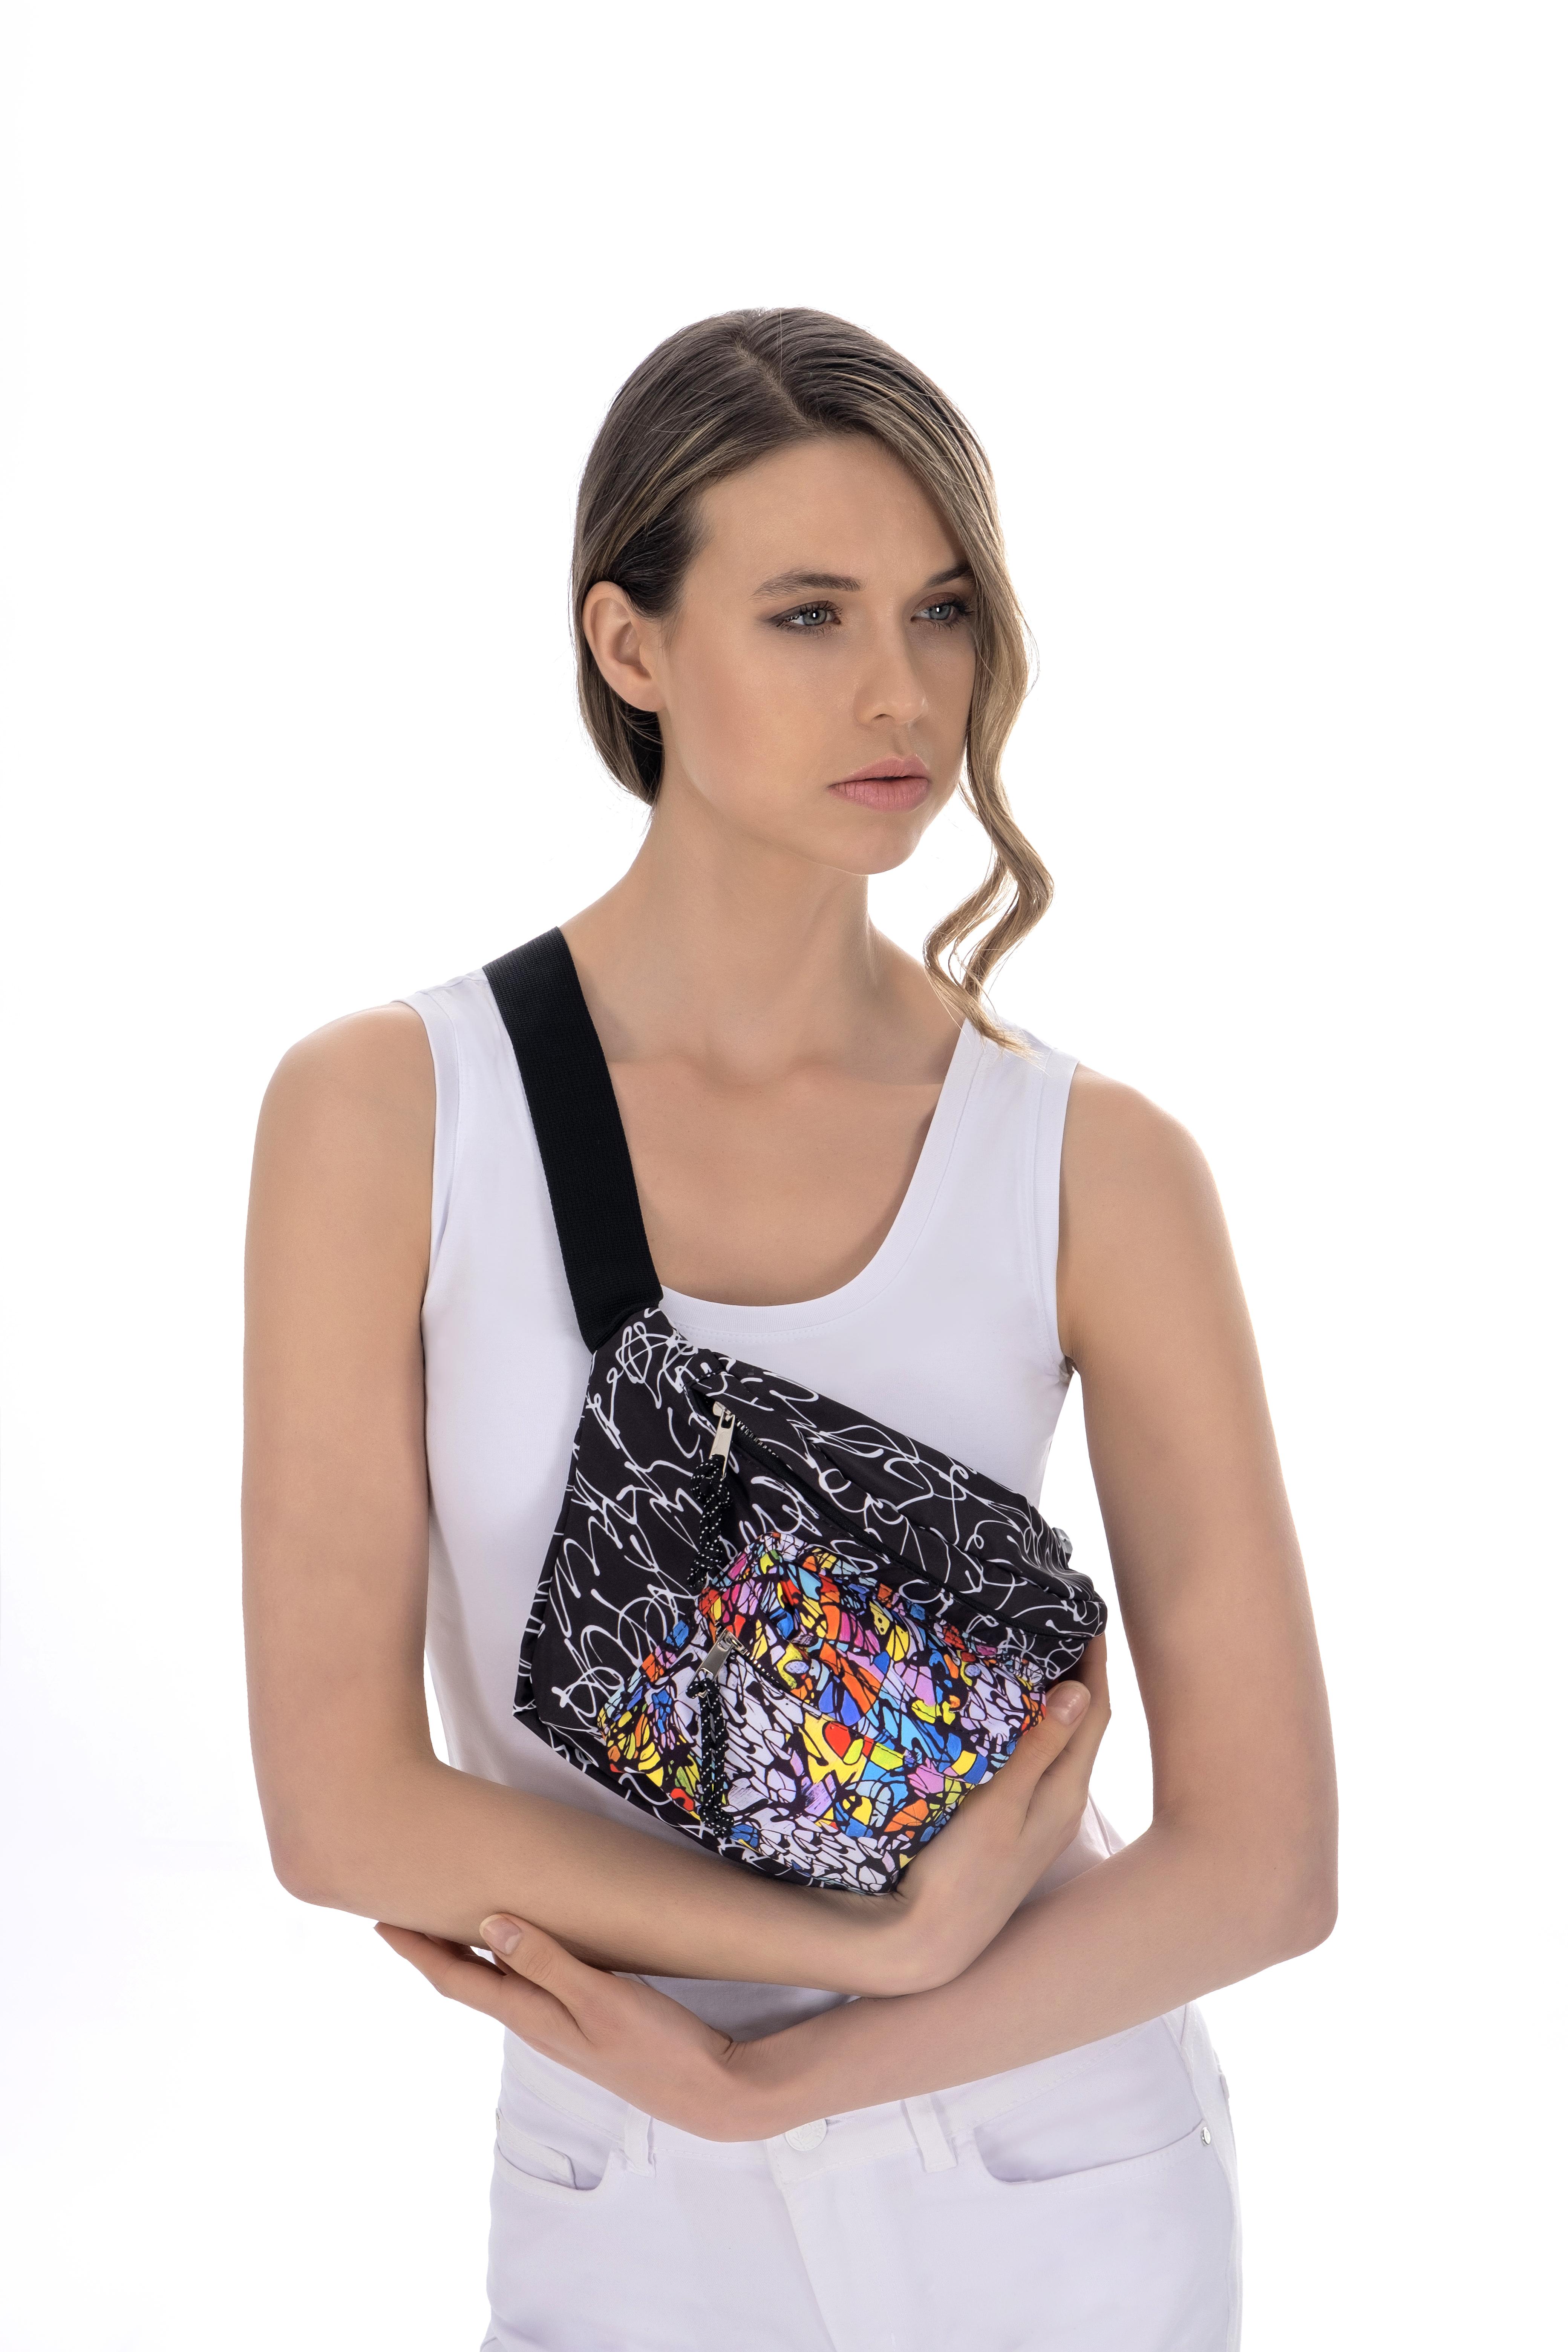 Simply Art Dolcezza: Black Board Abstract Art Belt Bag DOLCEZZA_SIMPLYART_21970_N